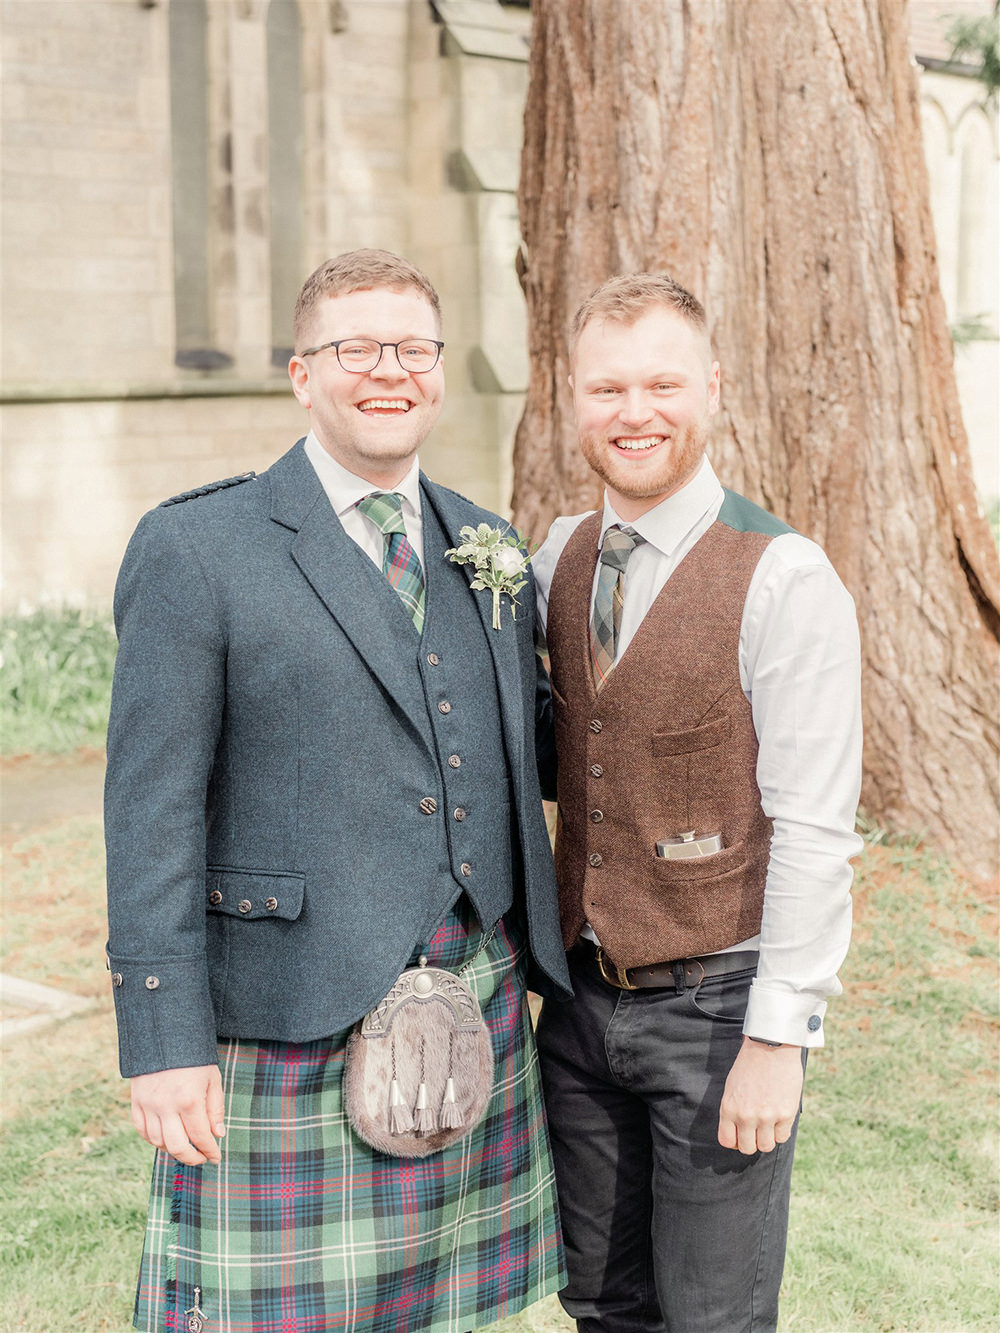 Groom Kilt Suit Tartan Tie Buttonhole Flowers Groomsman Lockdown Wedding Carn Patrick Photography